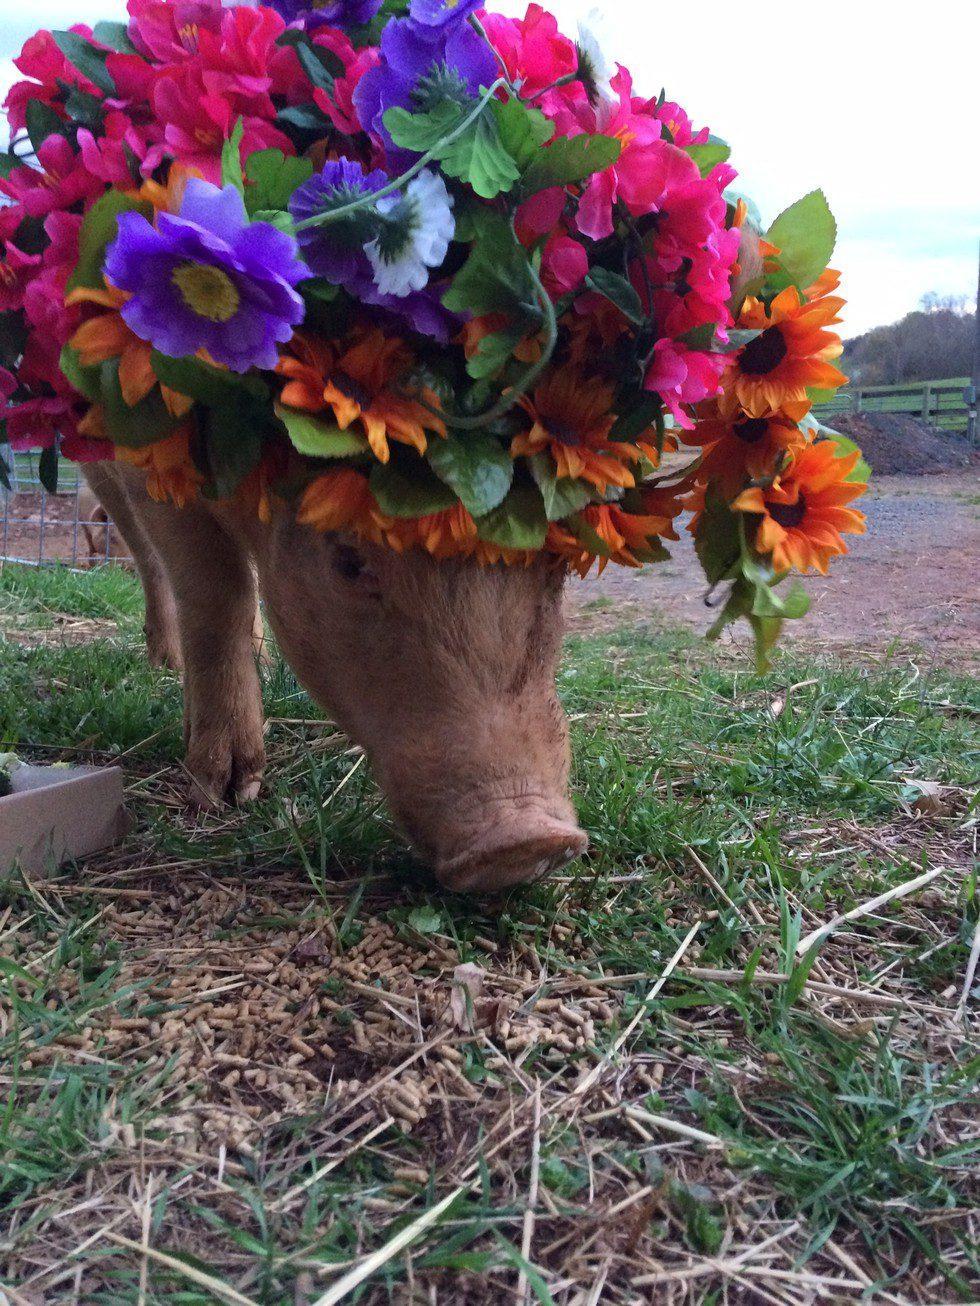 pigs flower crowns